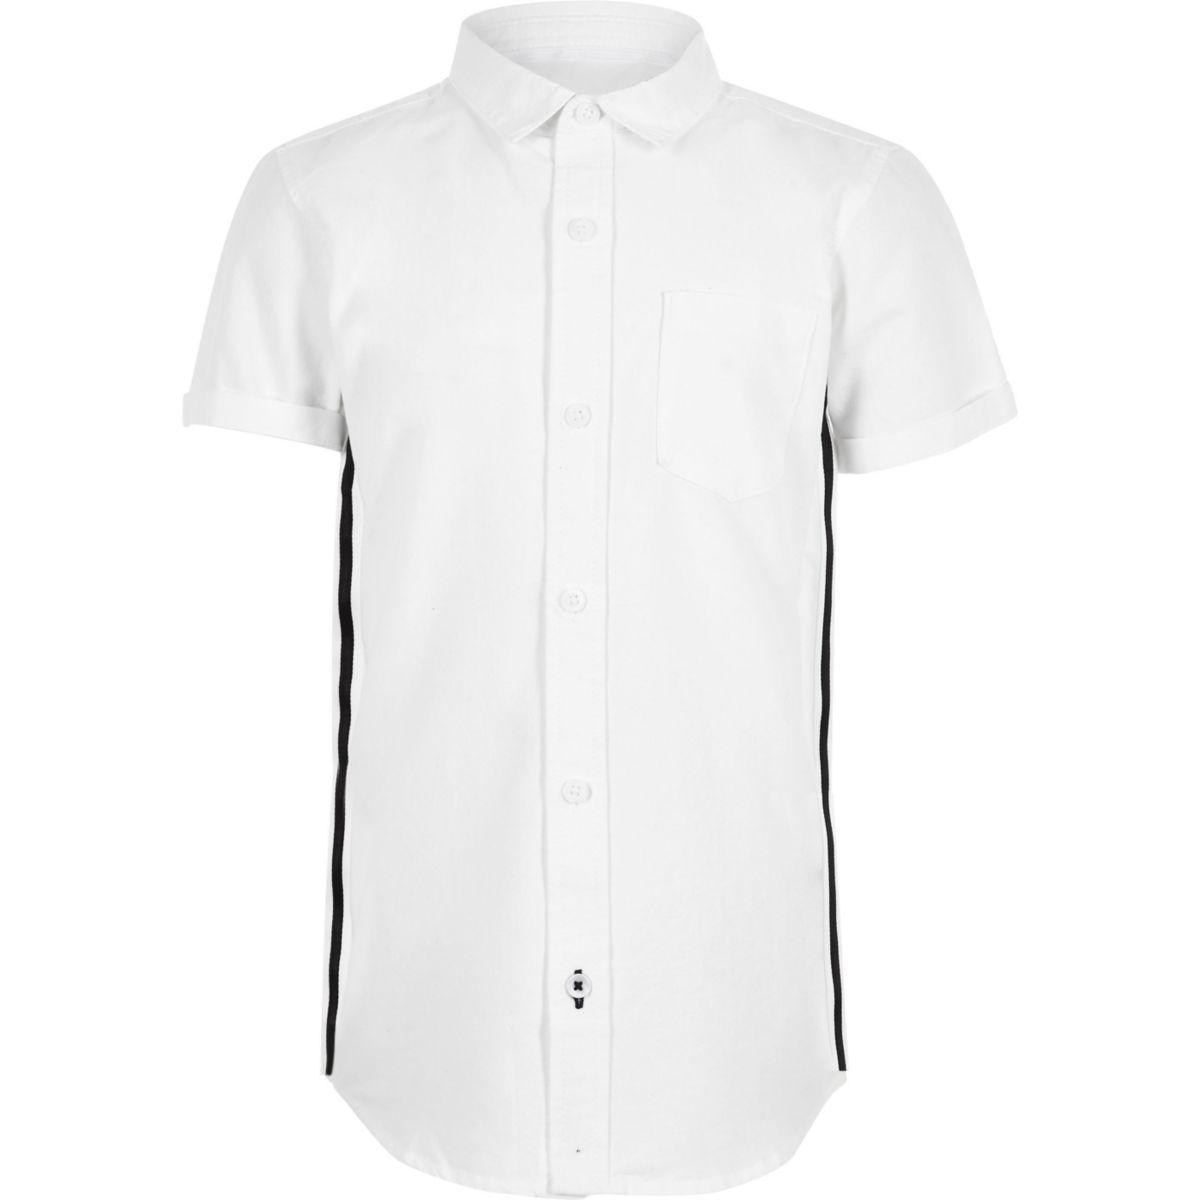 Boys white short sleeve tape Oxford shirt